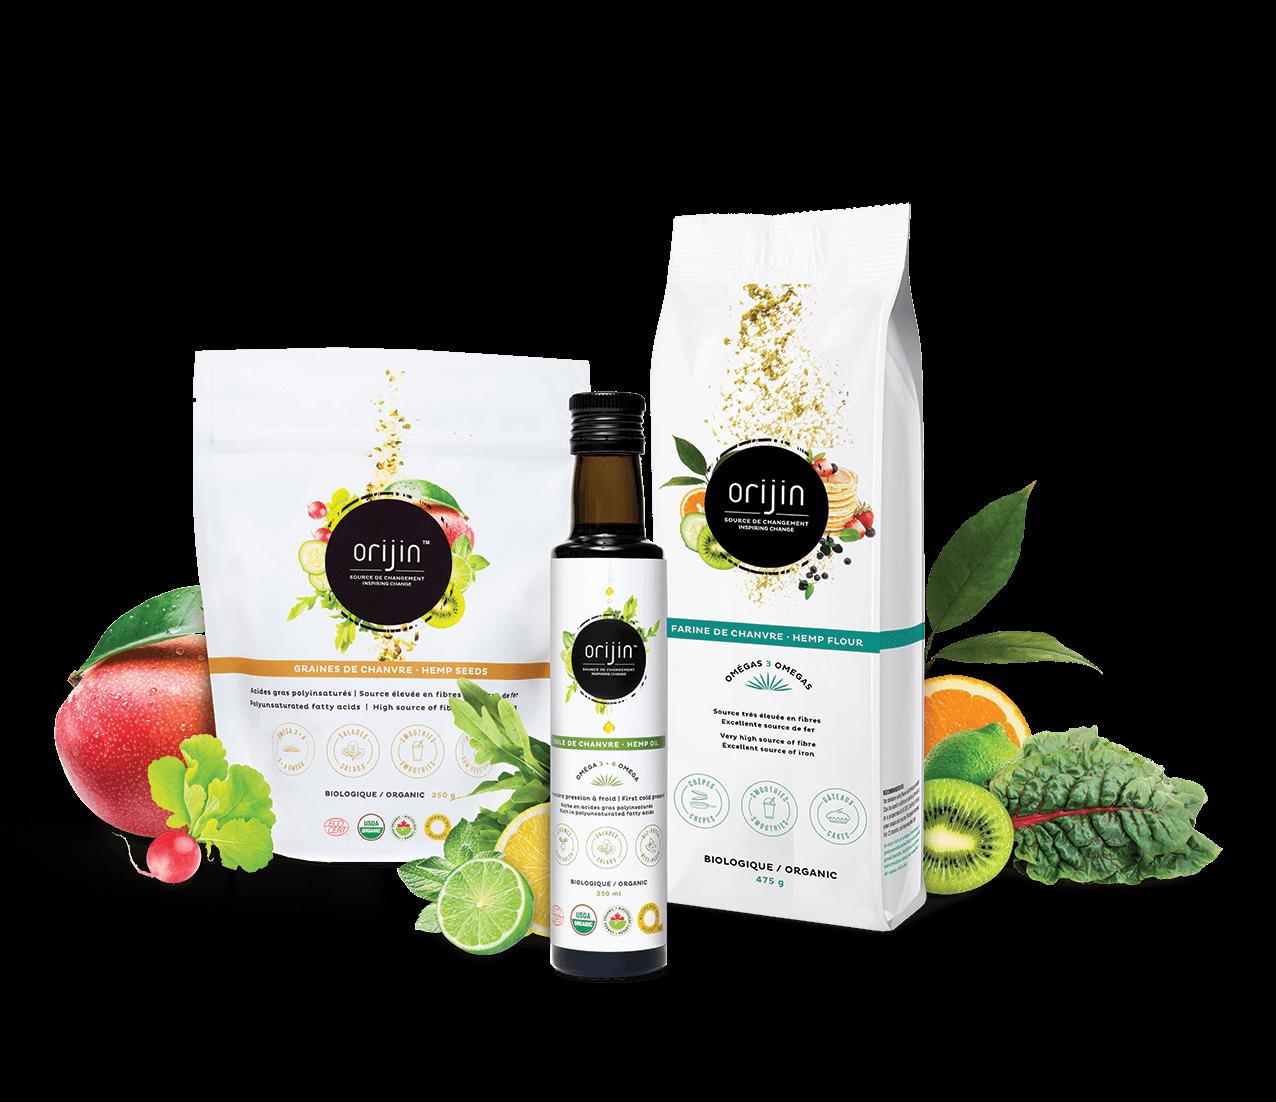 Orijin_Pack-promo_new graines de chanvre, huile de chanvre et farine de chanvre